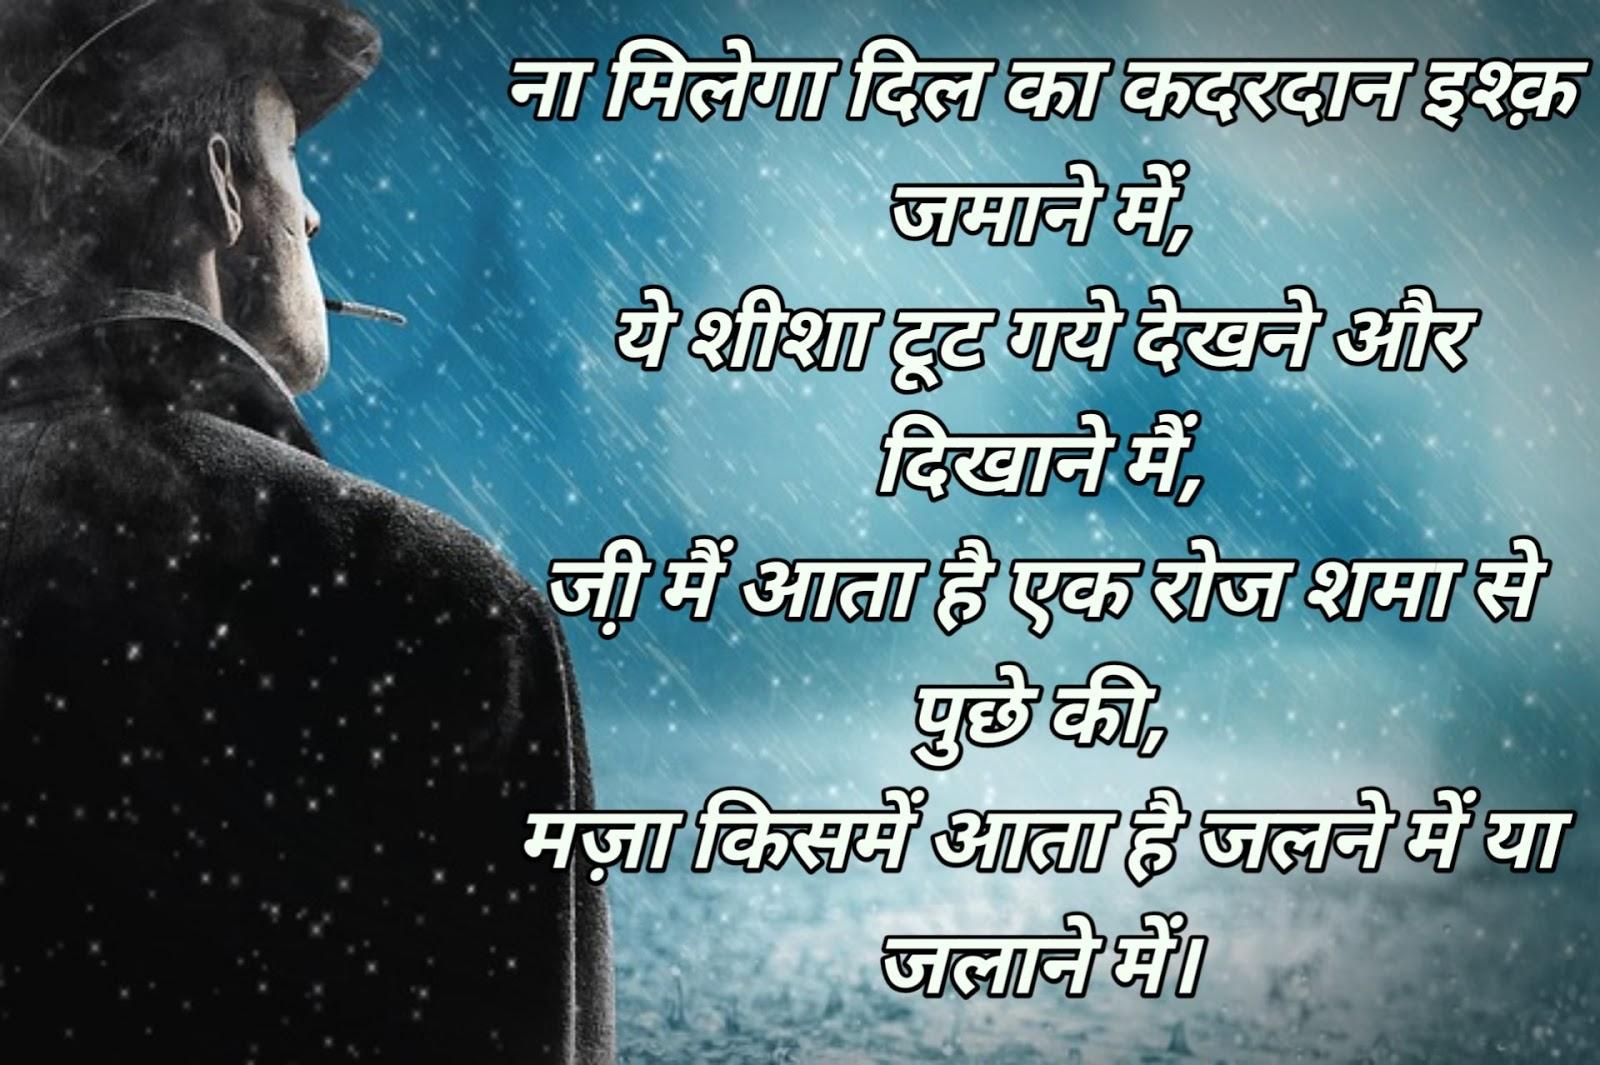 Sad love shayari 2 line